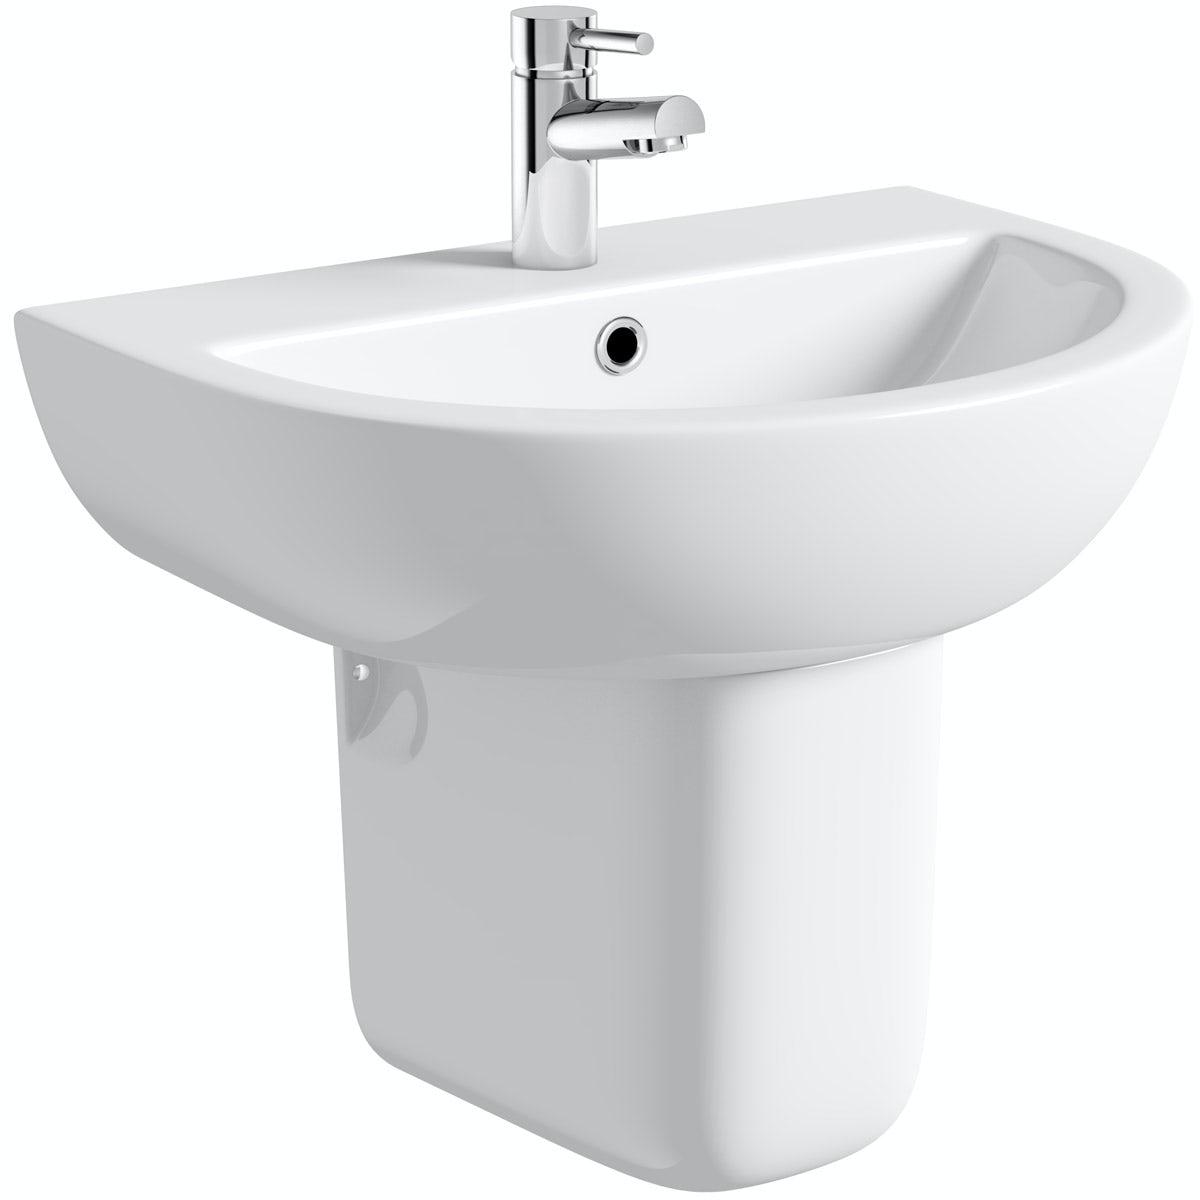 Orchard Elena 1 tap hole semi pedestal basin 450mm